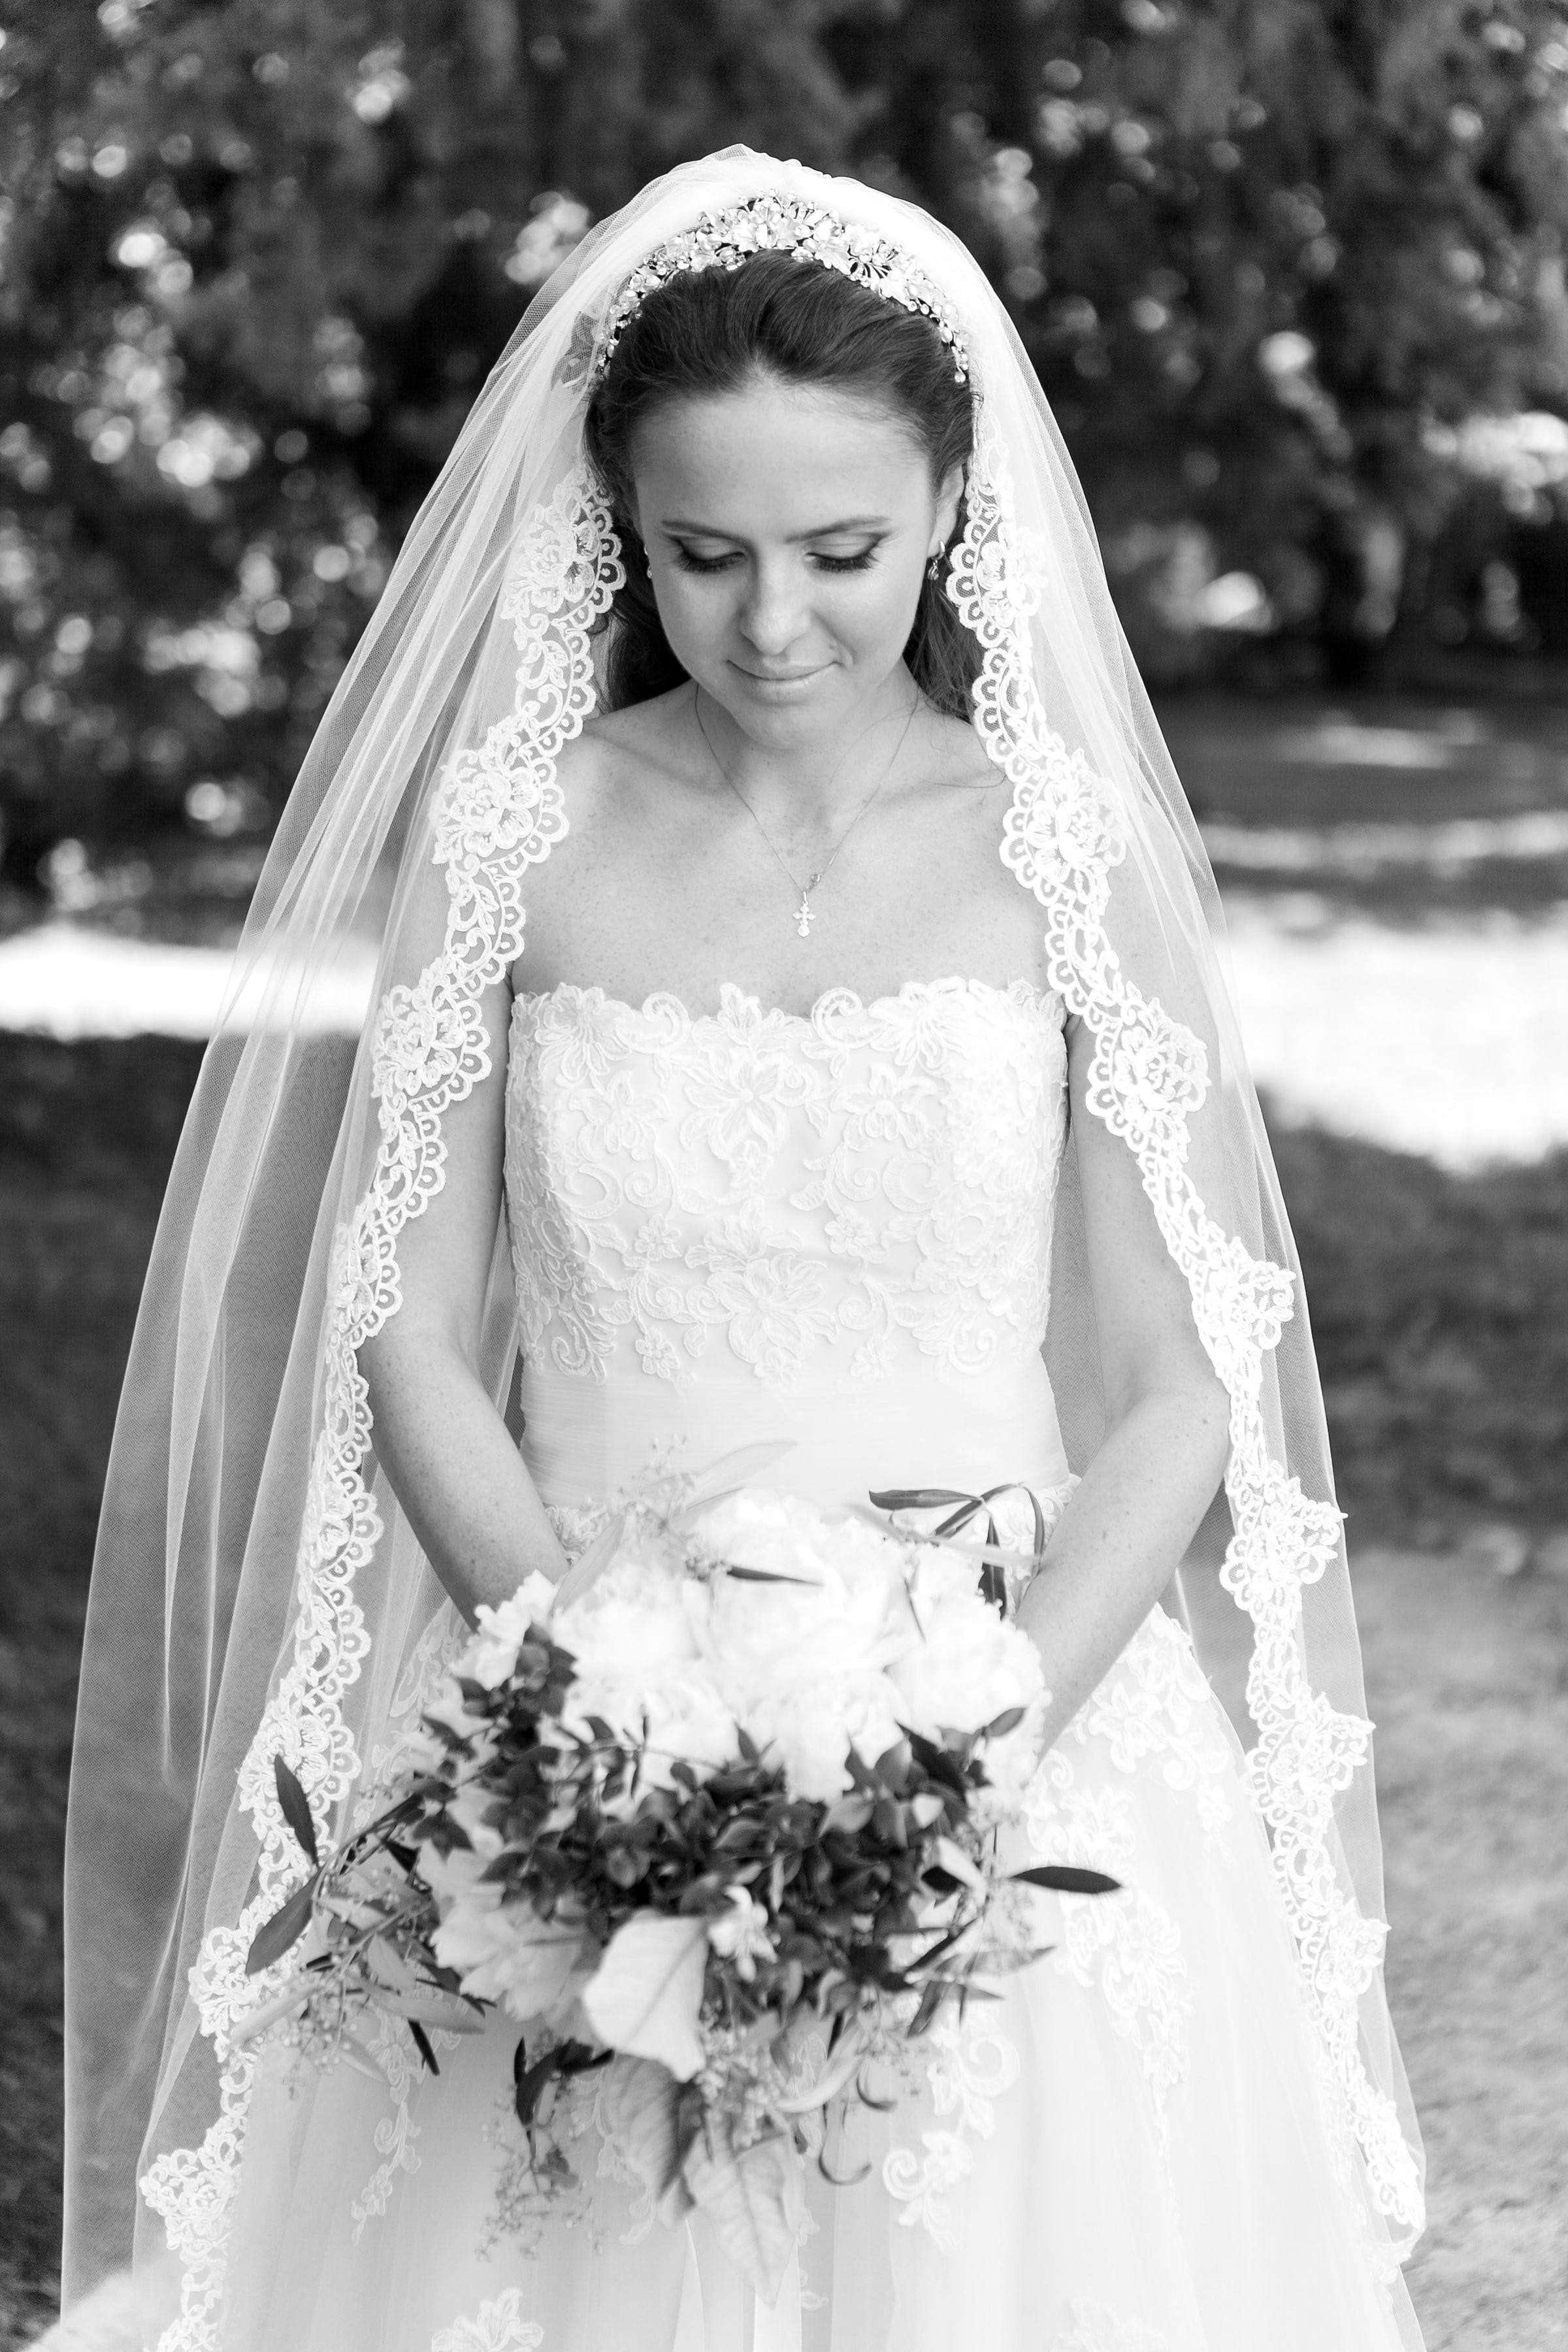 Bride wears a waltz length lace edge veil finish